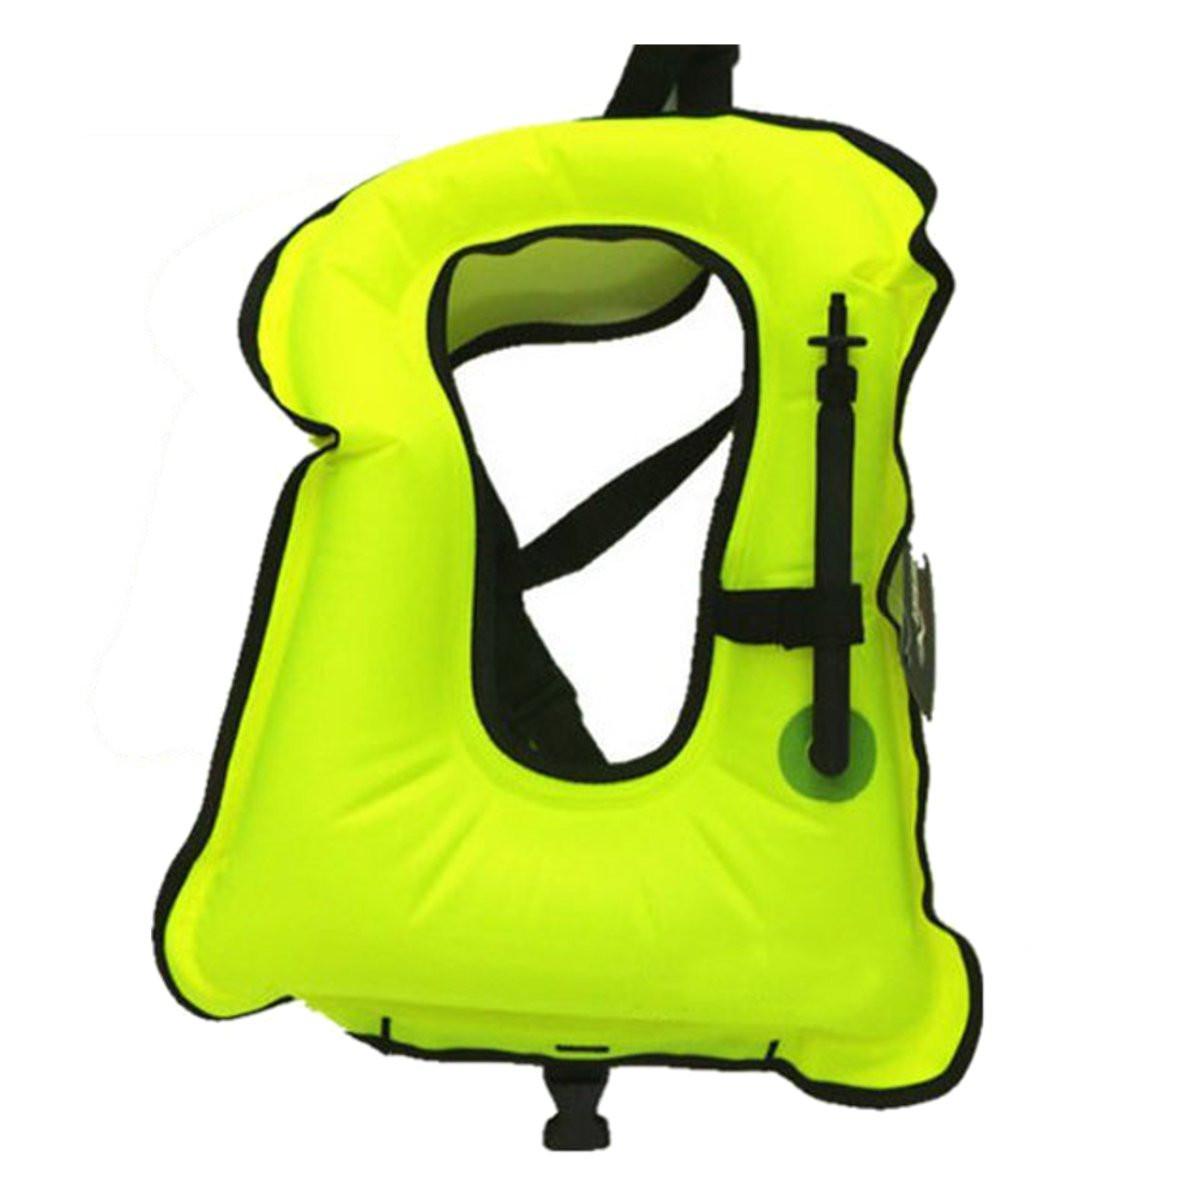 Free shipping Inflatable life jacket Super light Buoyancy vest Float ring swim Snorkeling dive suit Equipment swim Adult Kids(China (Mainland))